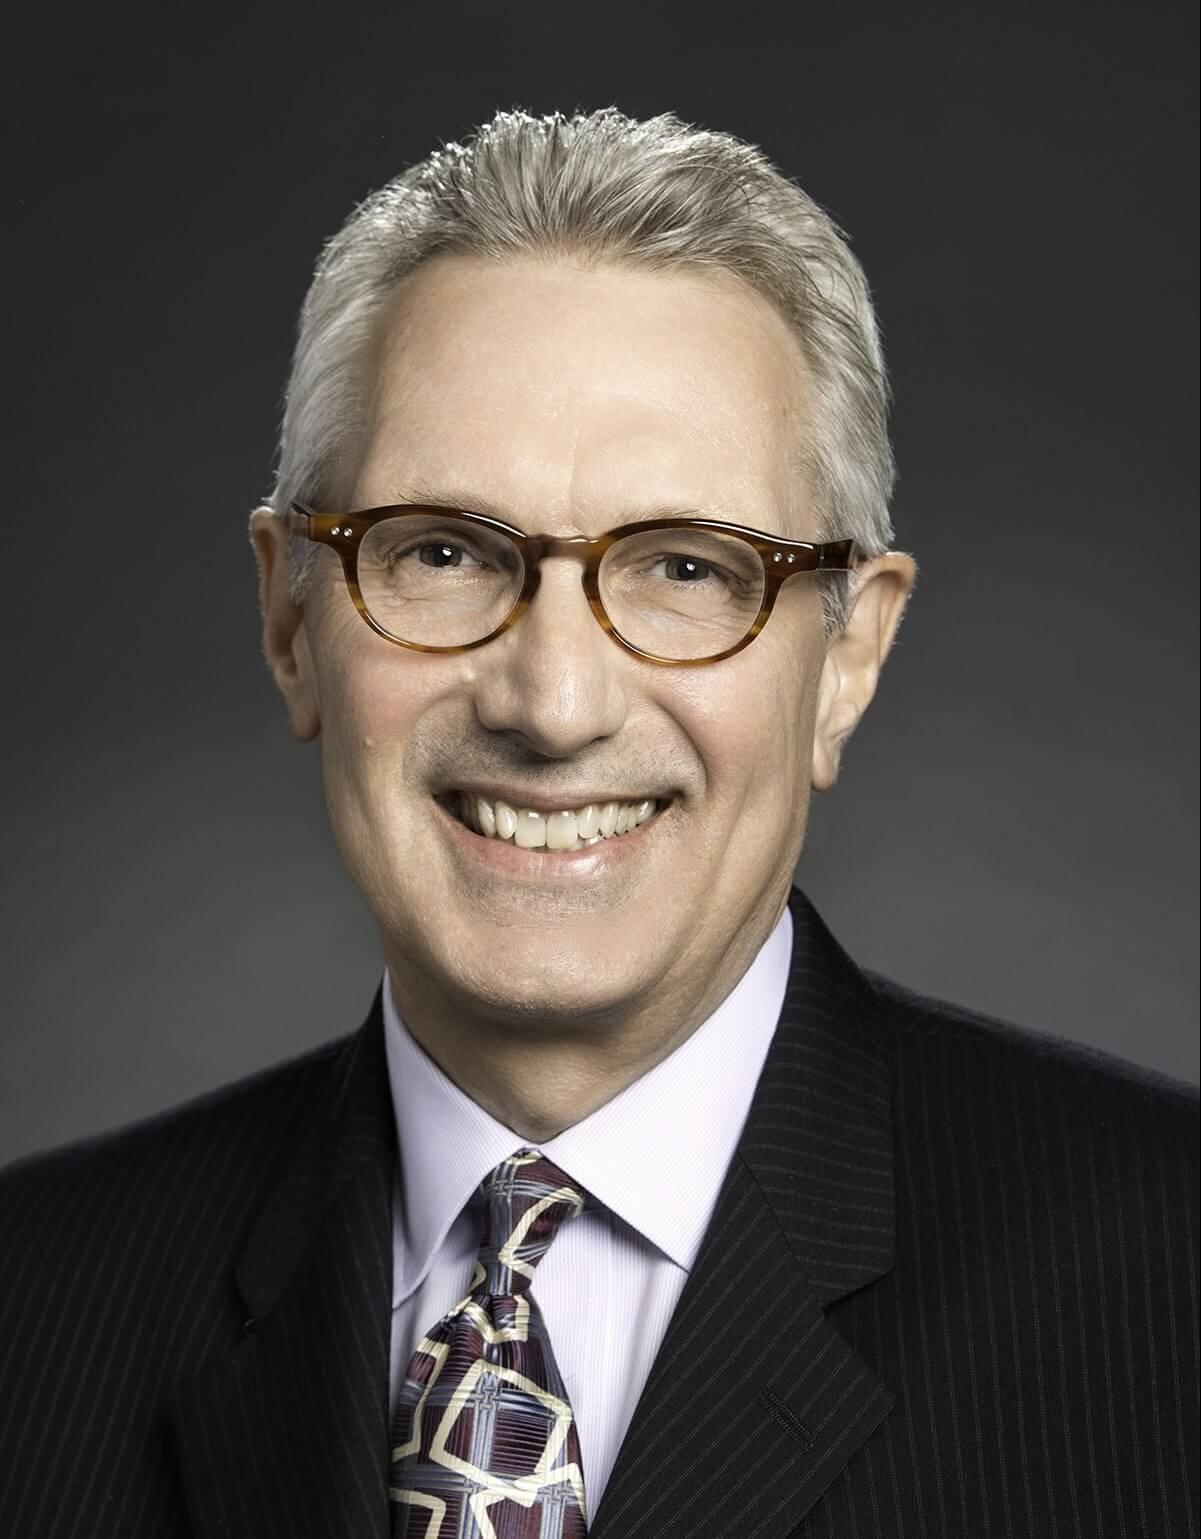 Chuck Stokes, interim CEO and president, Memorial Hermann Health System